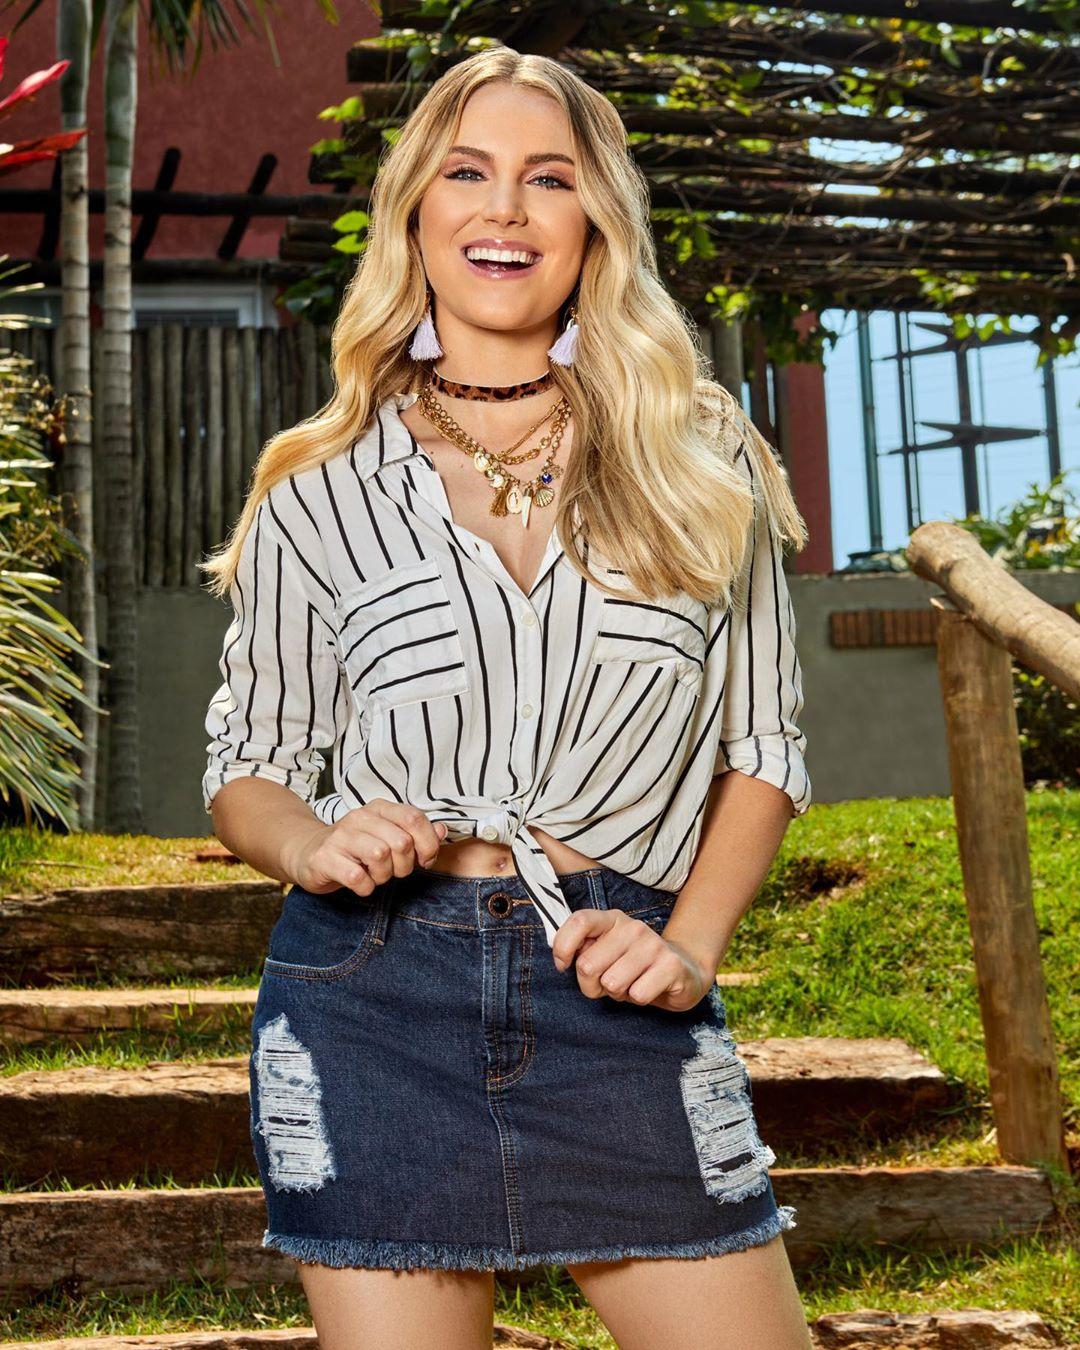 amanda pegoraro , miss brasil de las americas 2019. - Página 2 72213910